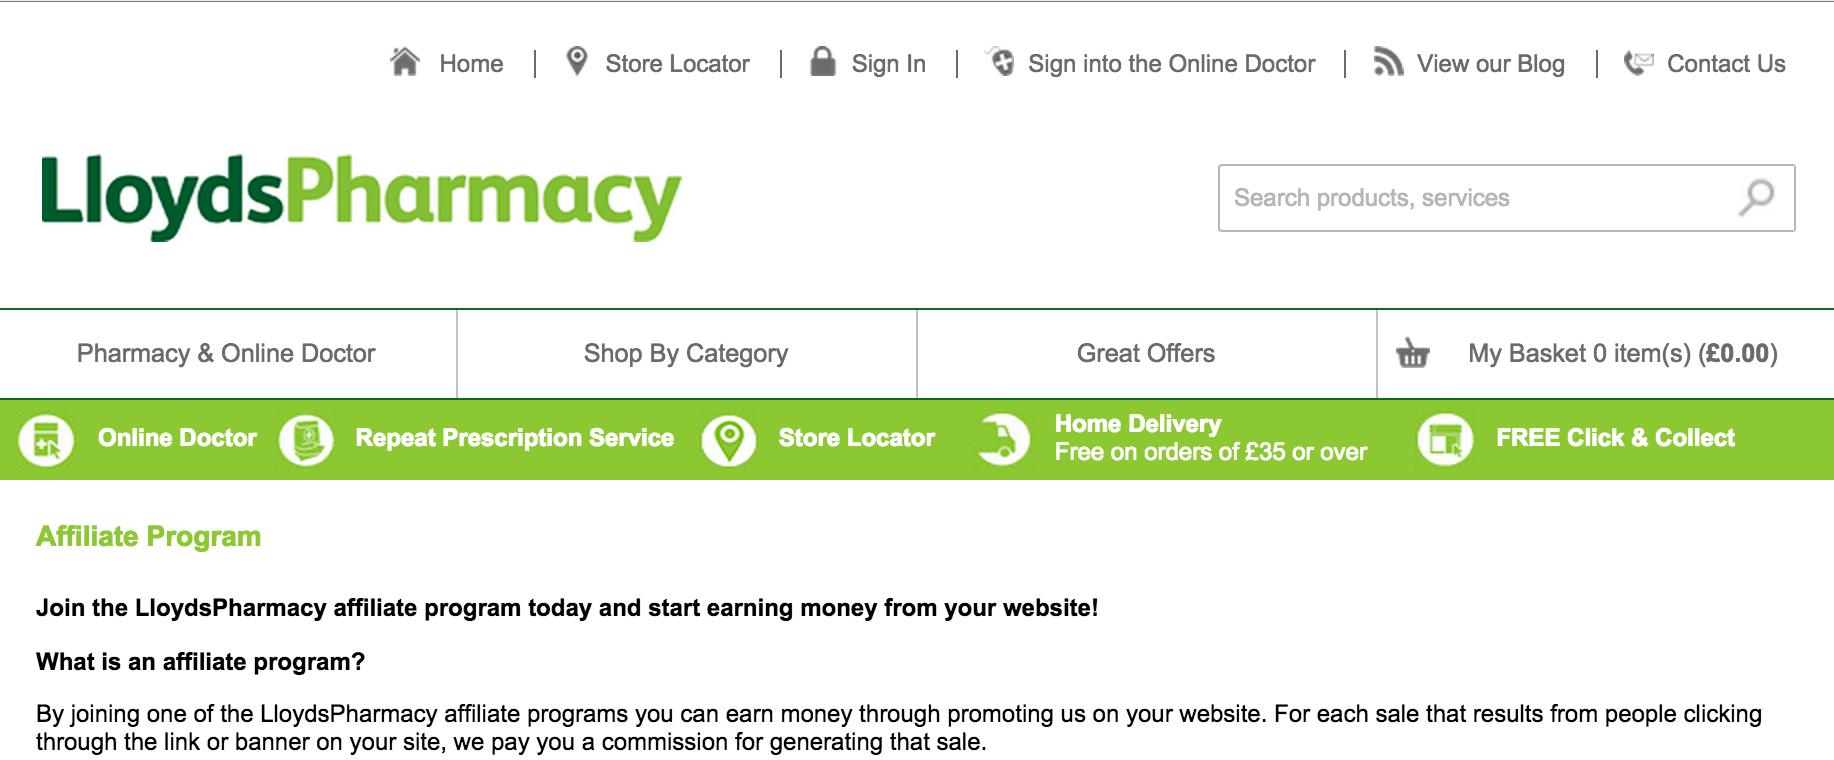 Lloyds Pharmacy - Pharmacy Affiliate Programs